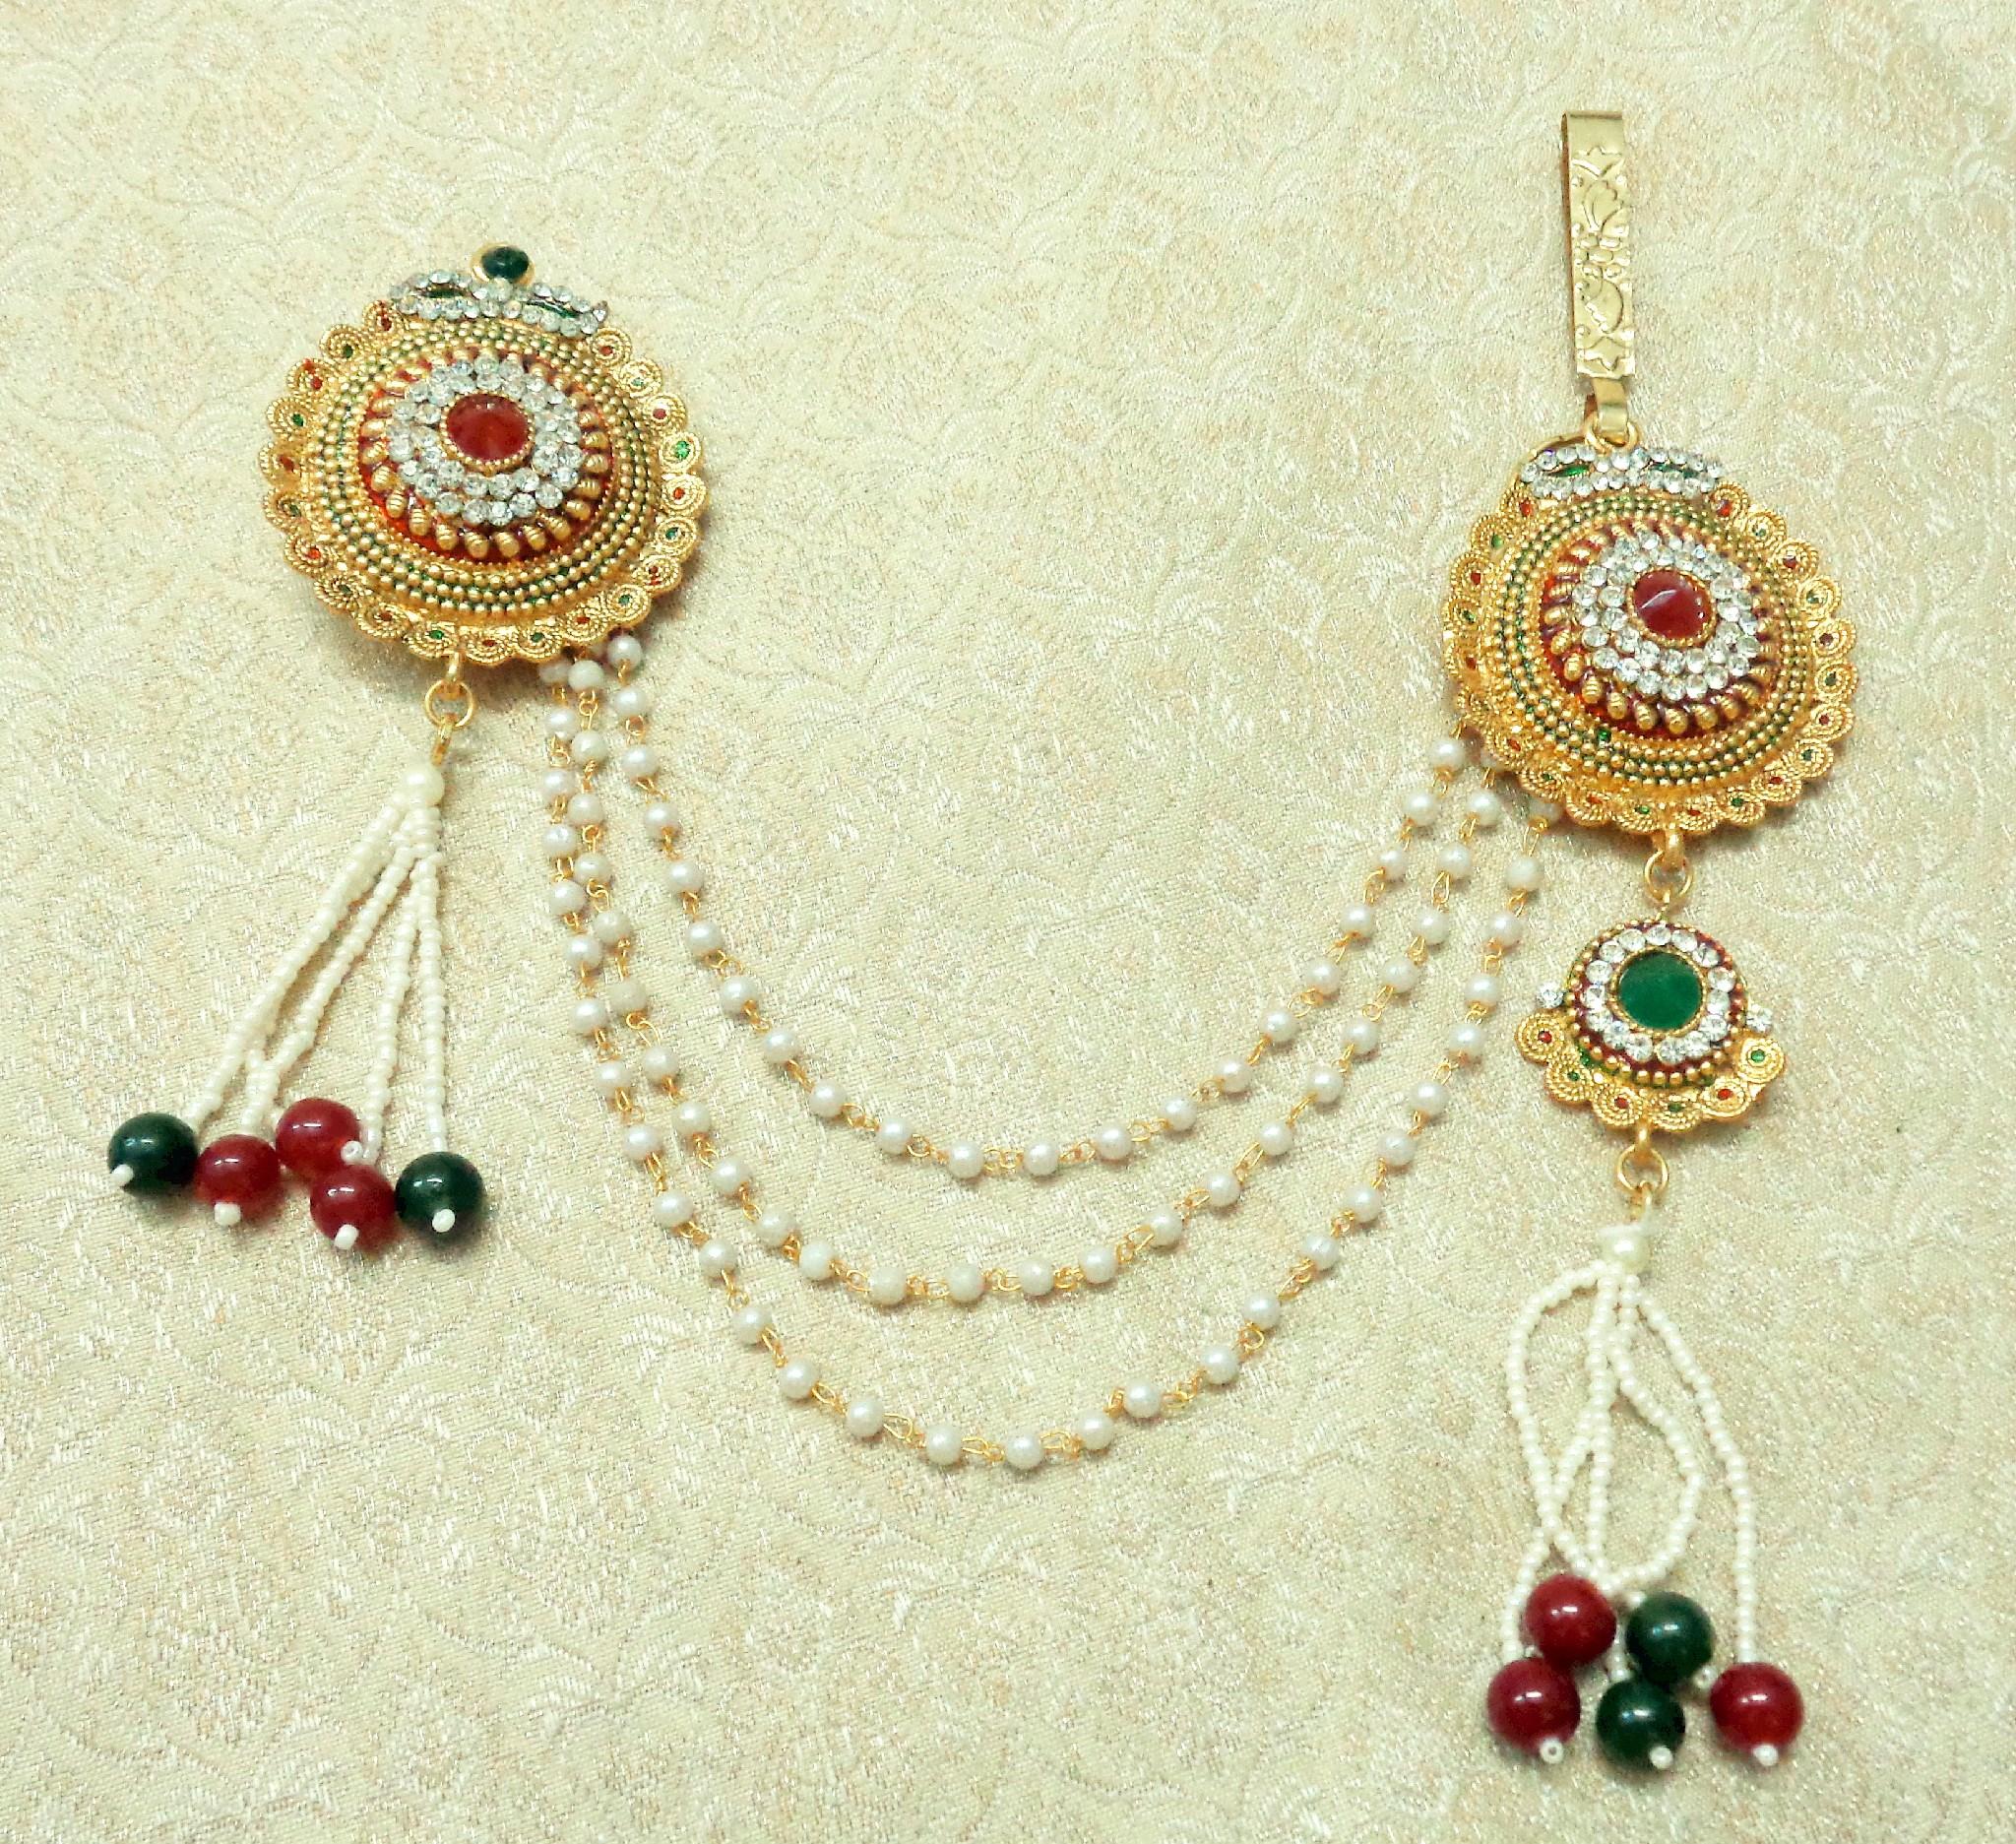 3566ac129 Multi-colour Stone Meenakari Gold plated Sareepin Brooch juda Kamarband for  wedding Festival - LSPJ03_MG - LALSO - 2756396